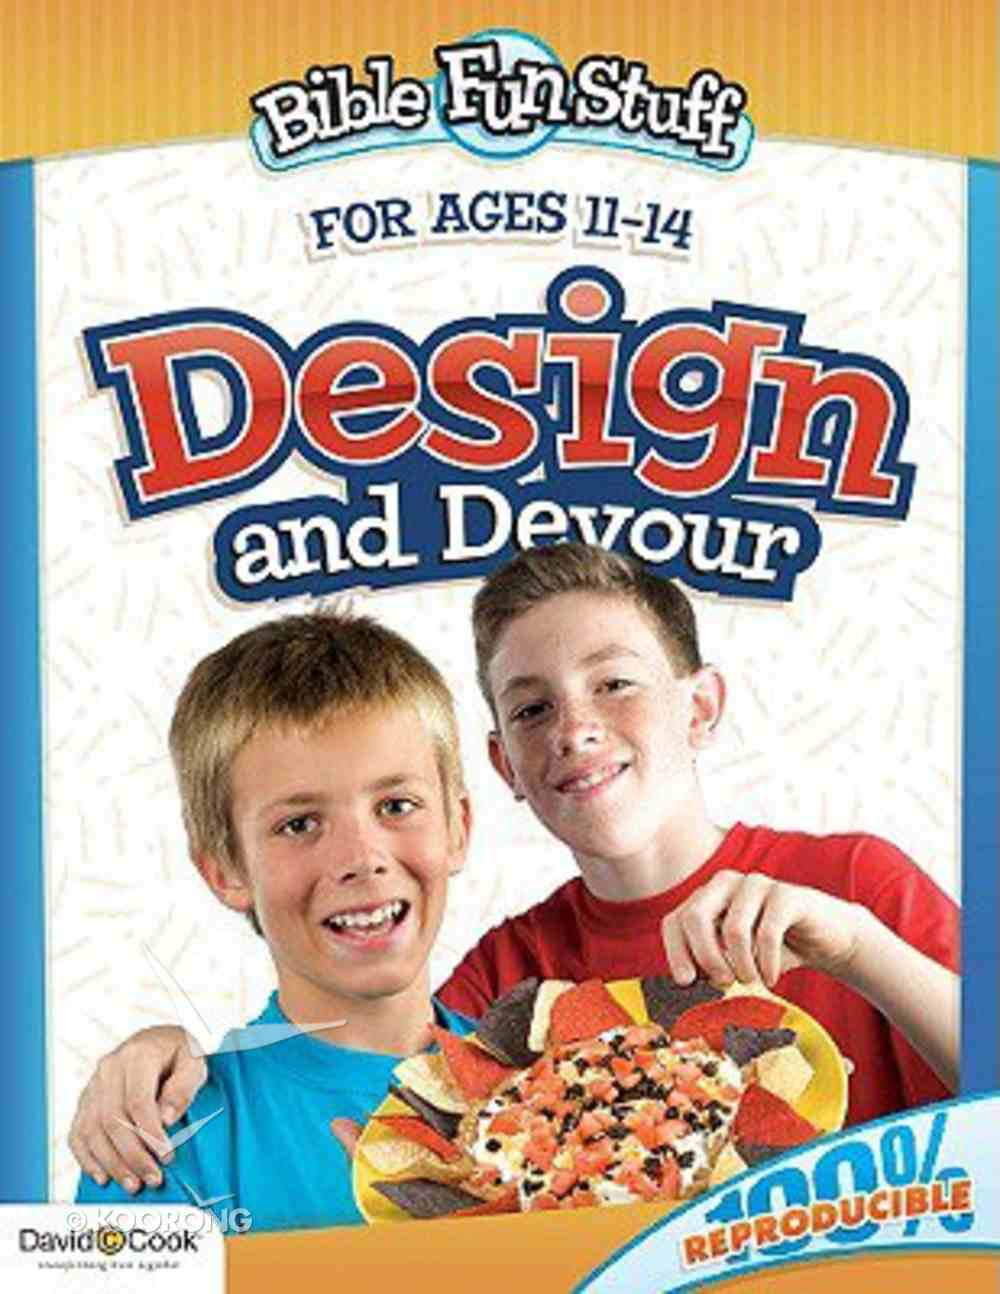 Design and Devour (Reproducible) (Ages 11-14) (Bible Fun Stuff Series) Paperback